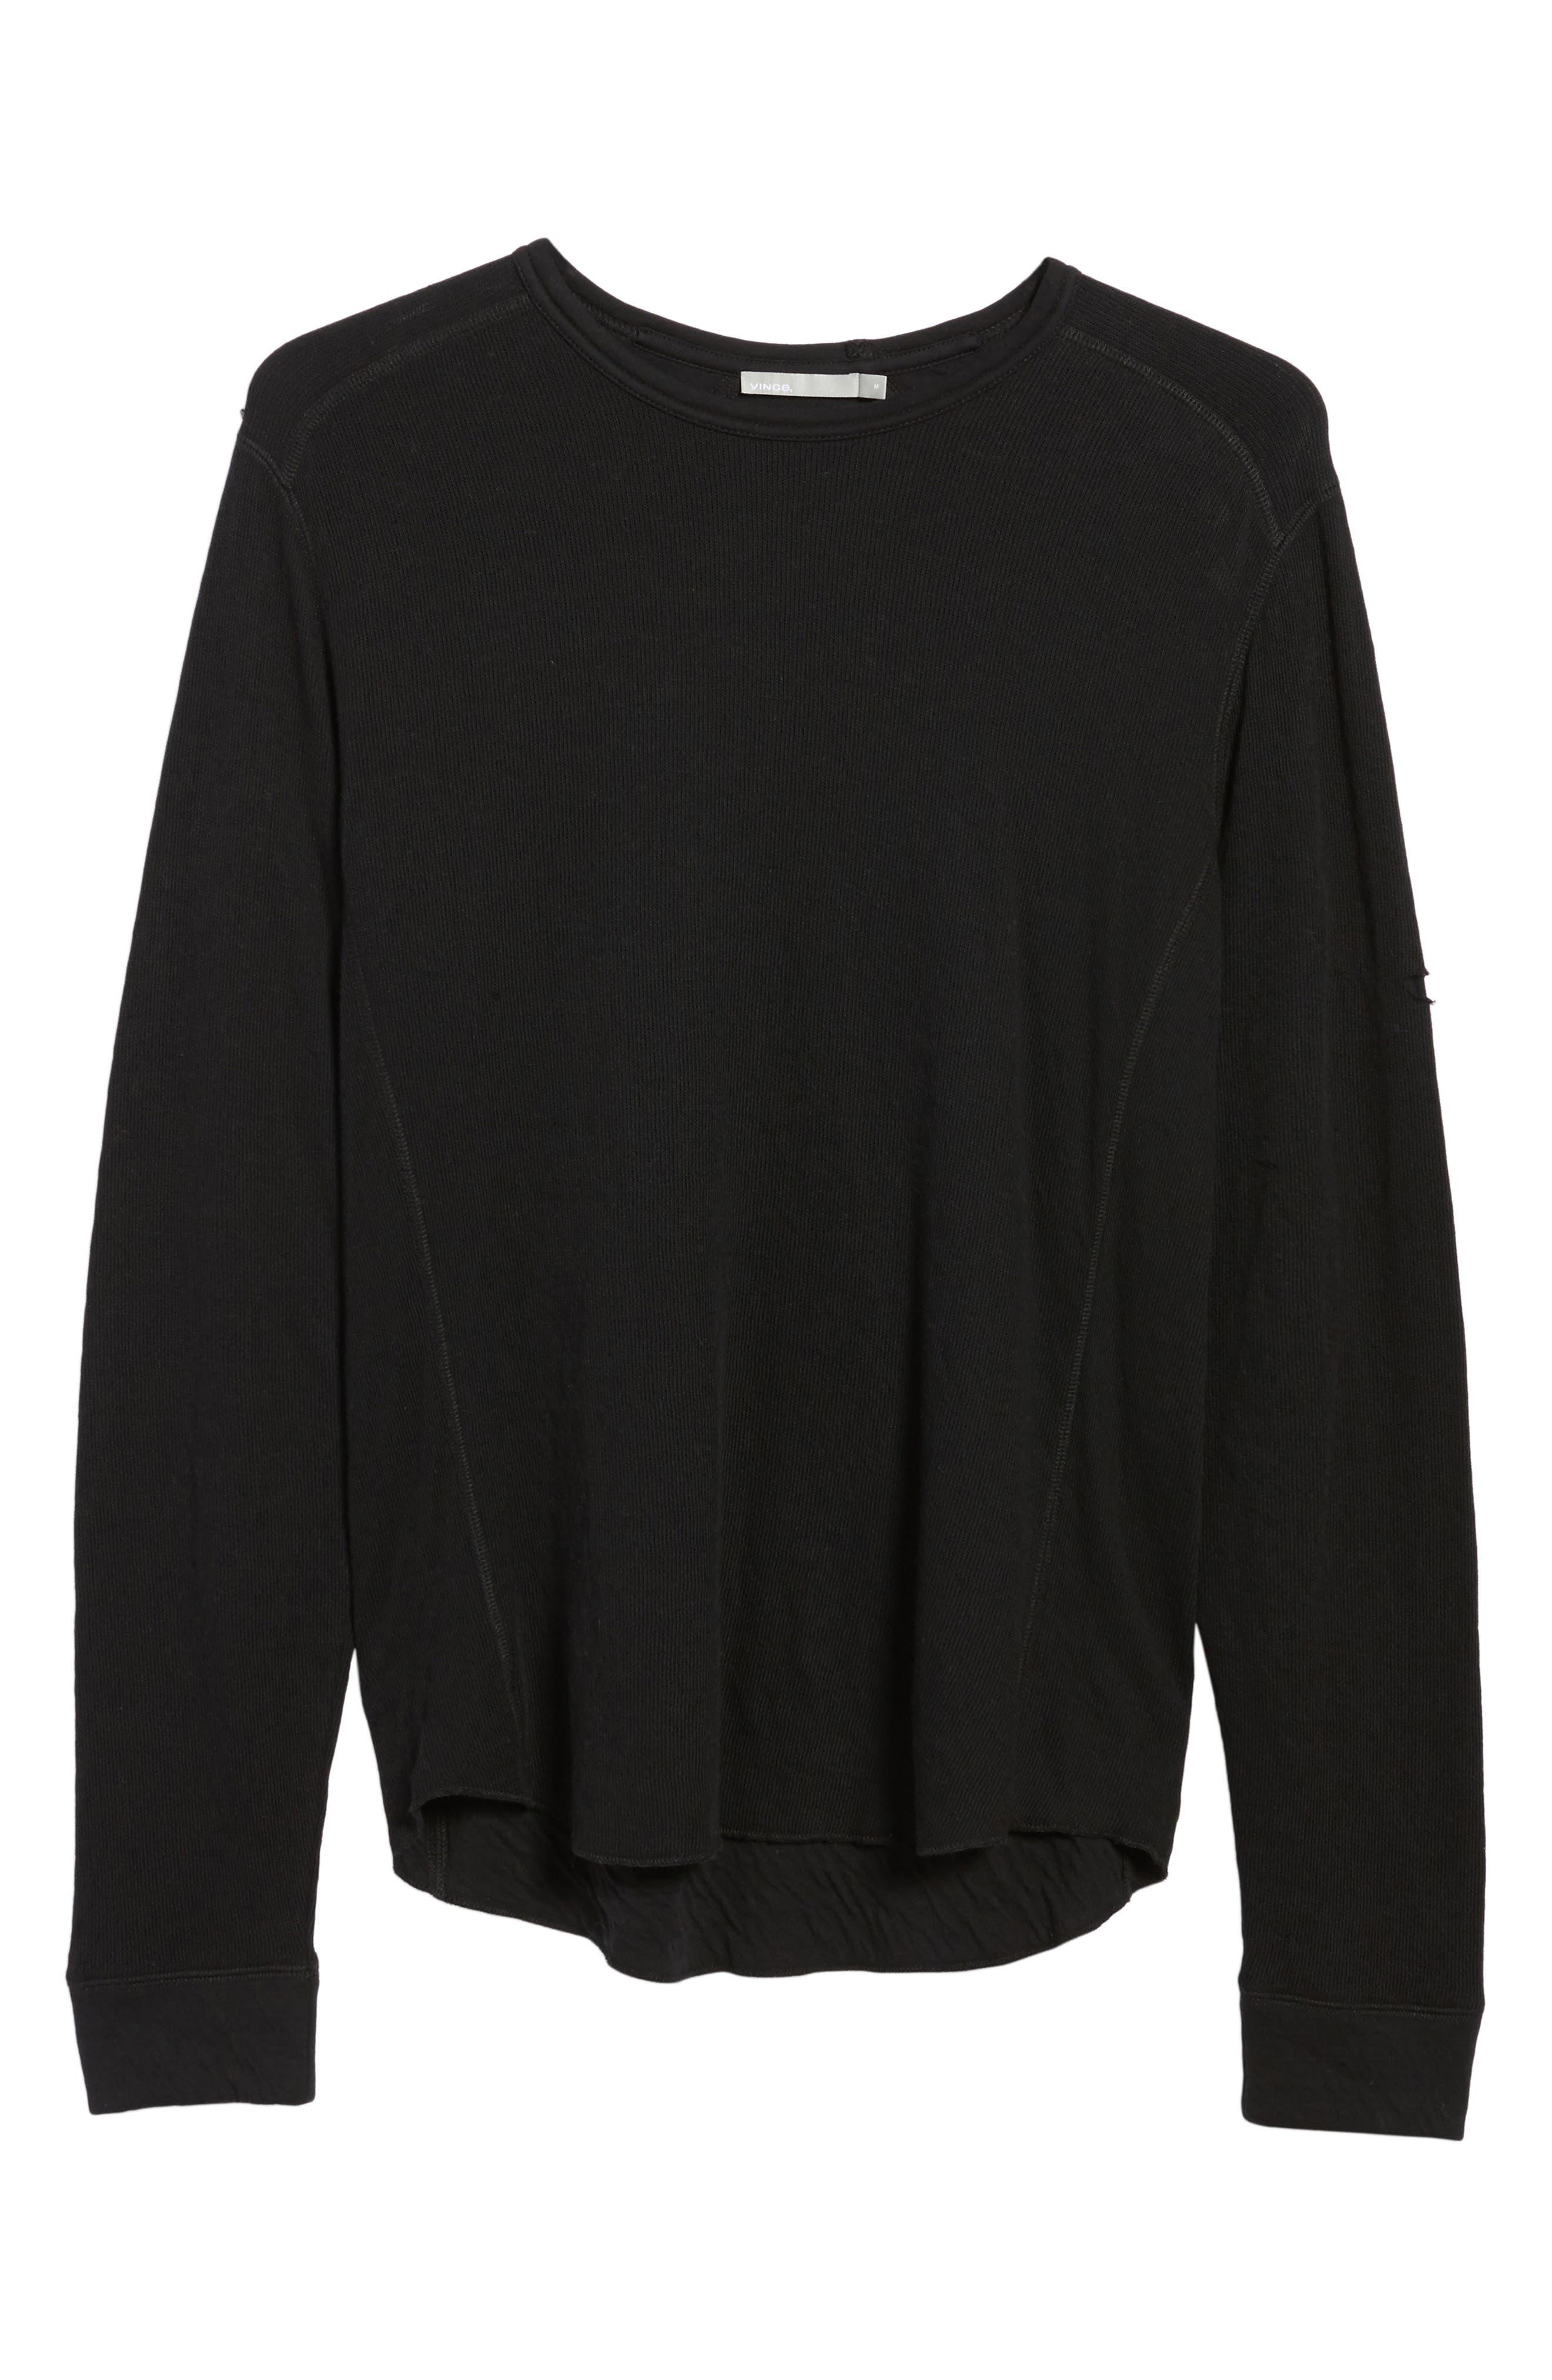 VINCE, Double Knit Long Sleeve T-Shirt, Alternate thumbnail 6, color, BLACK